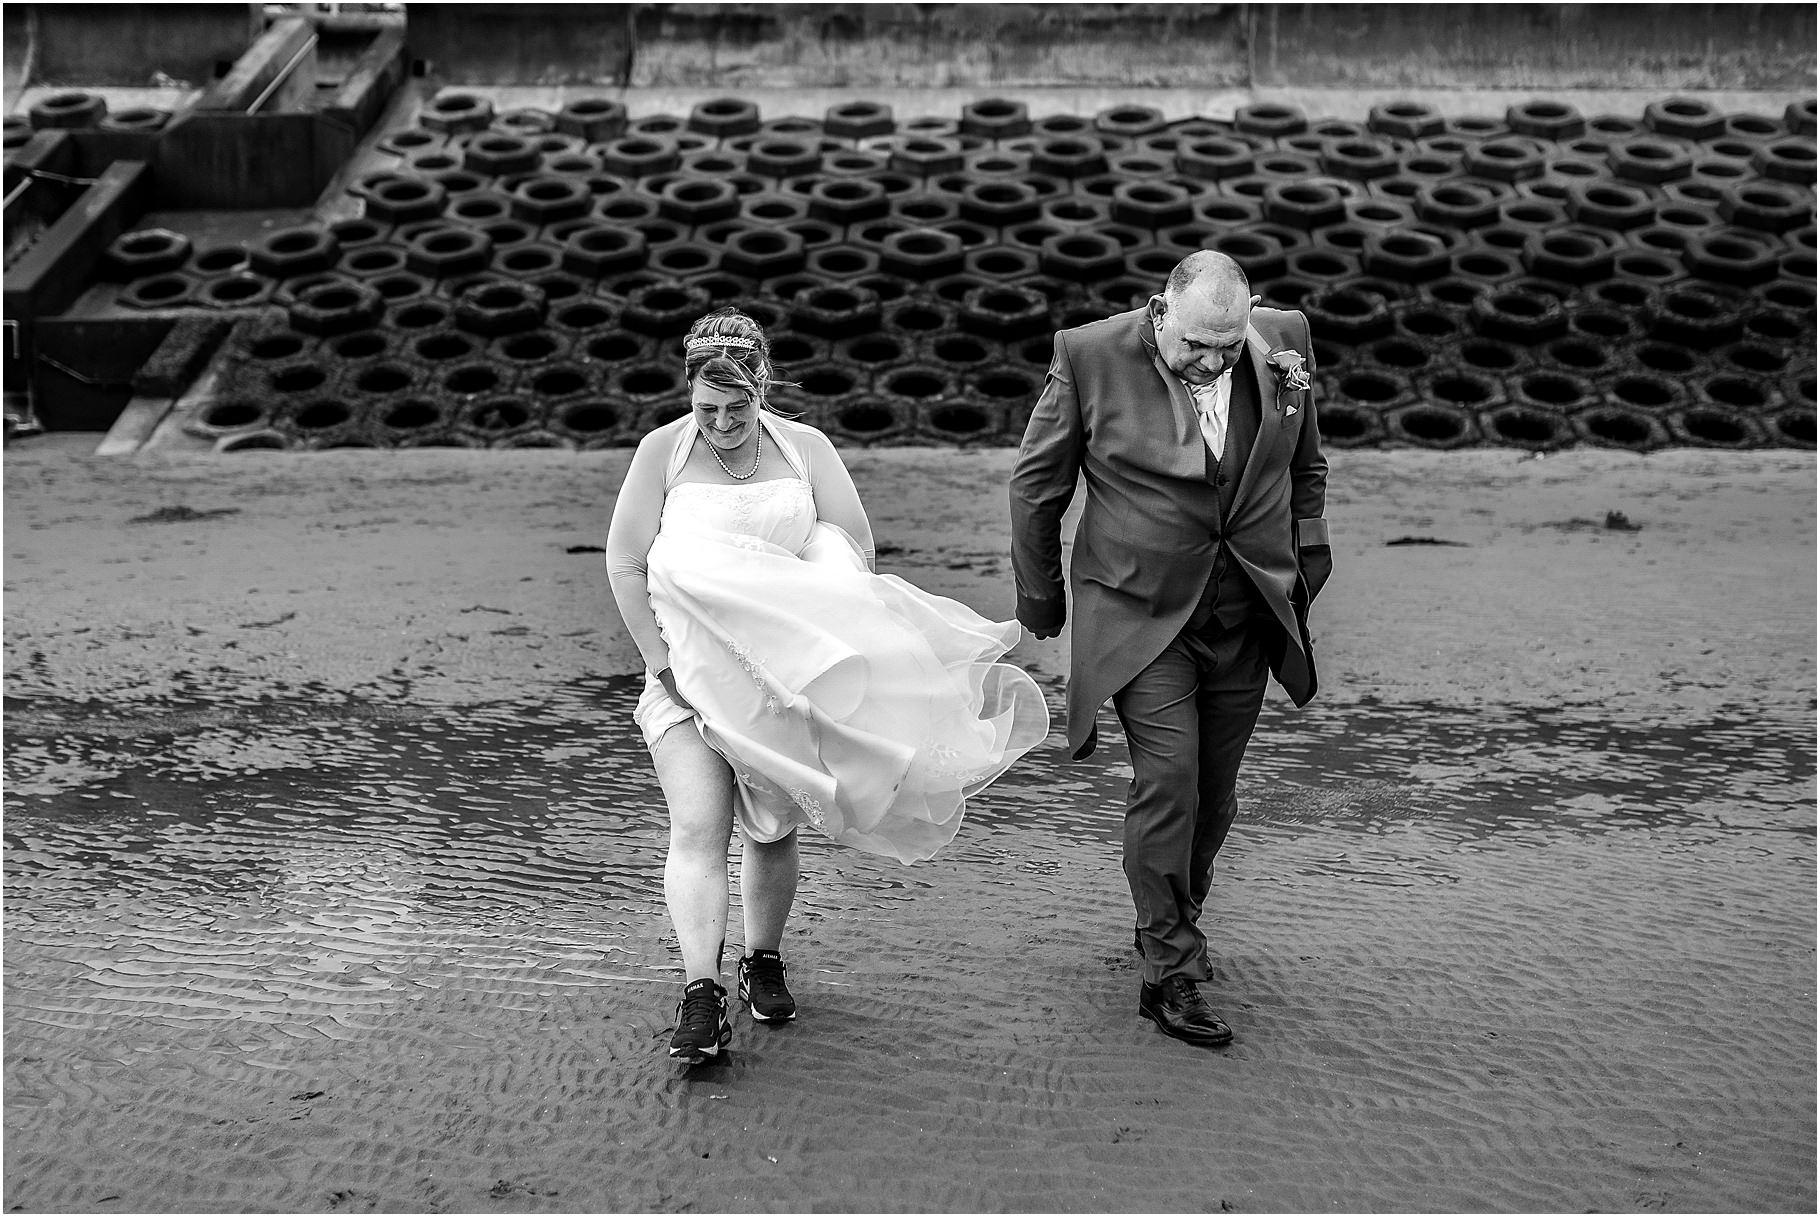 dan-wootton-photography-2017-weddings-006.jpg